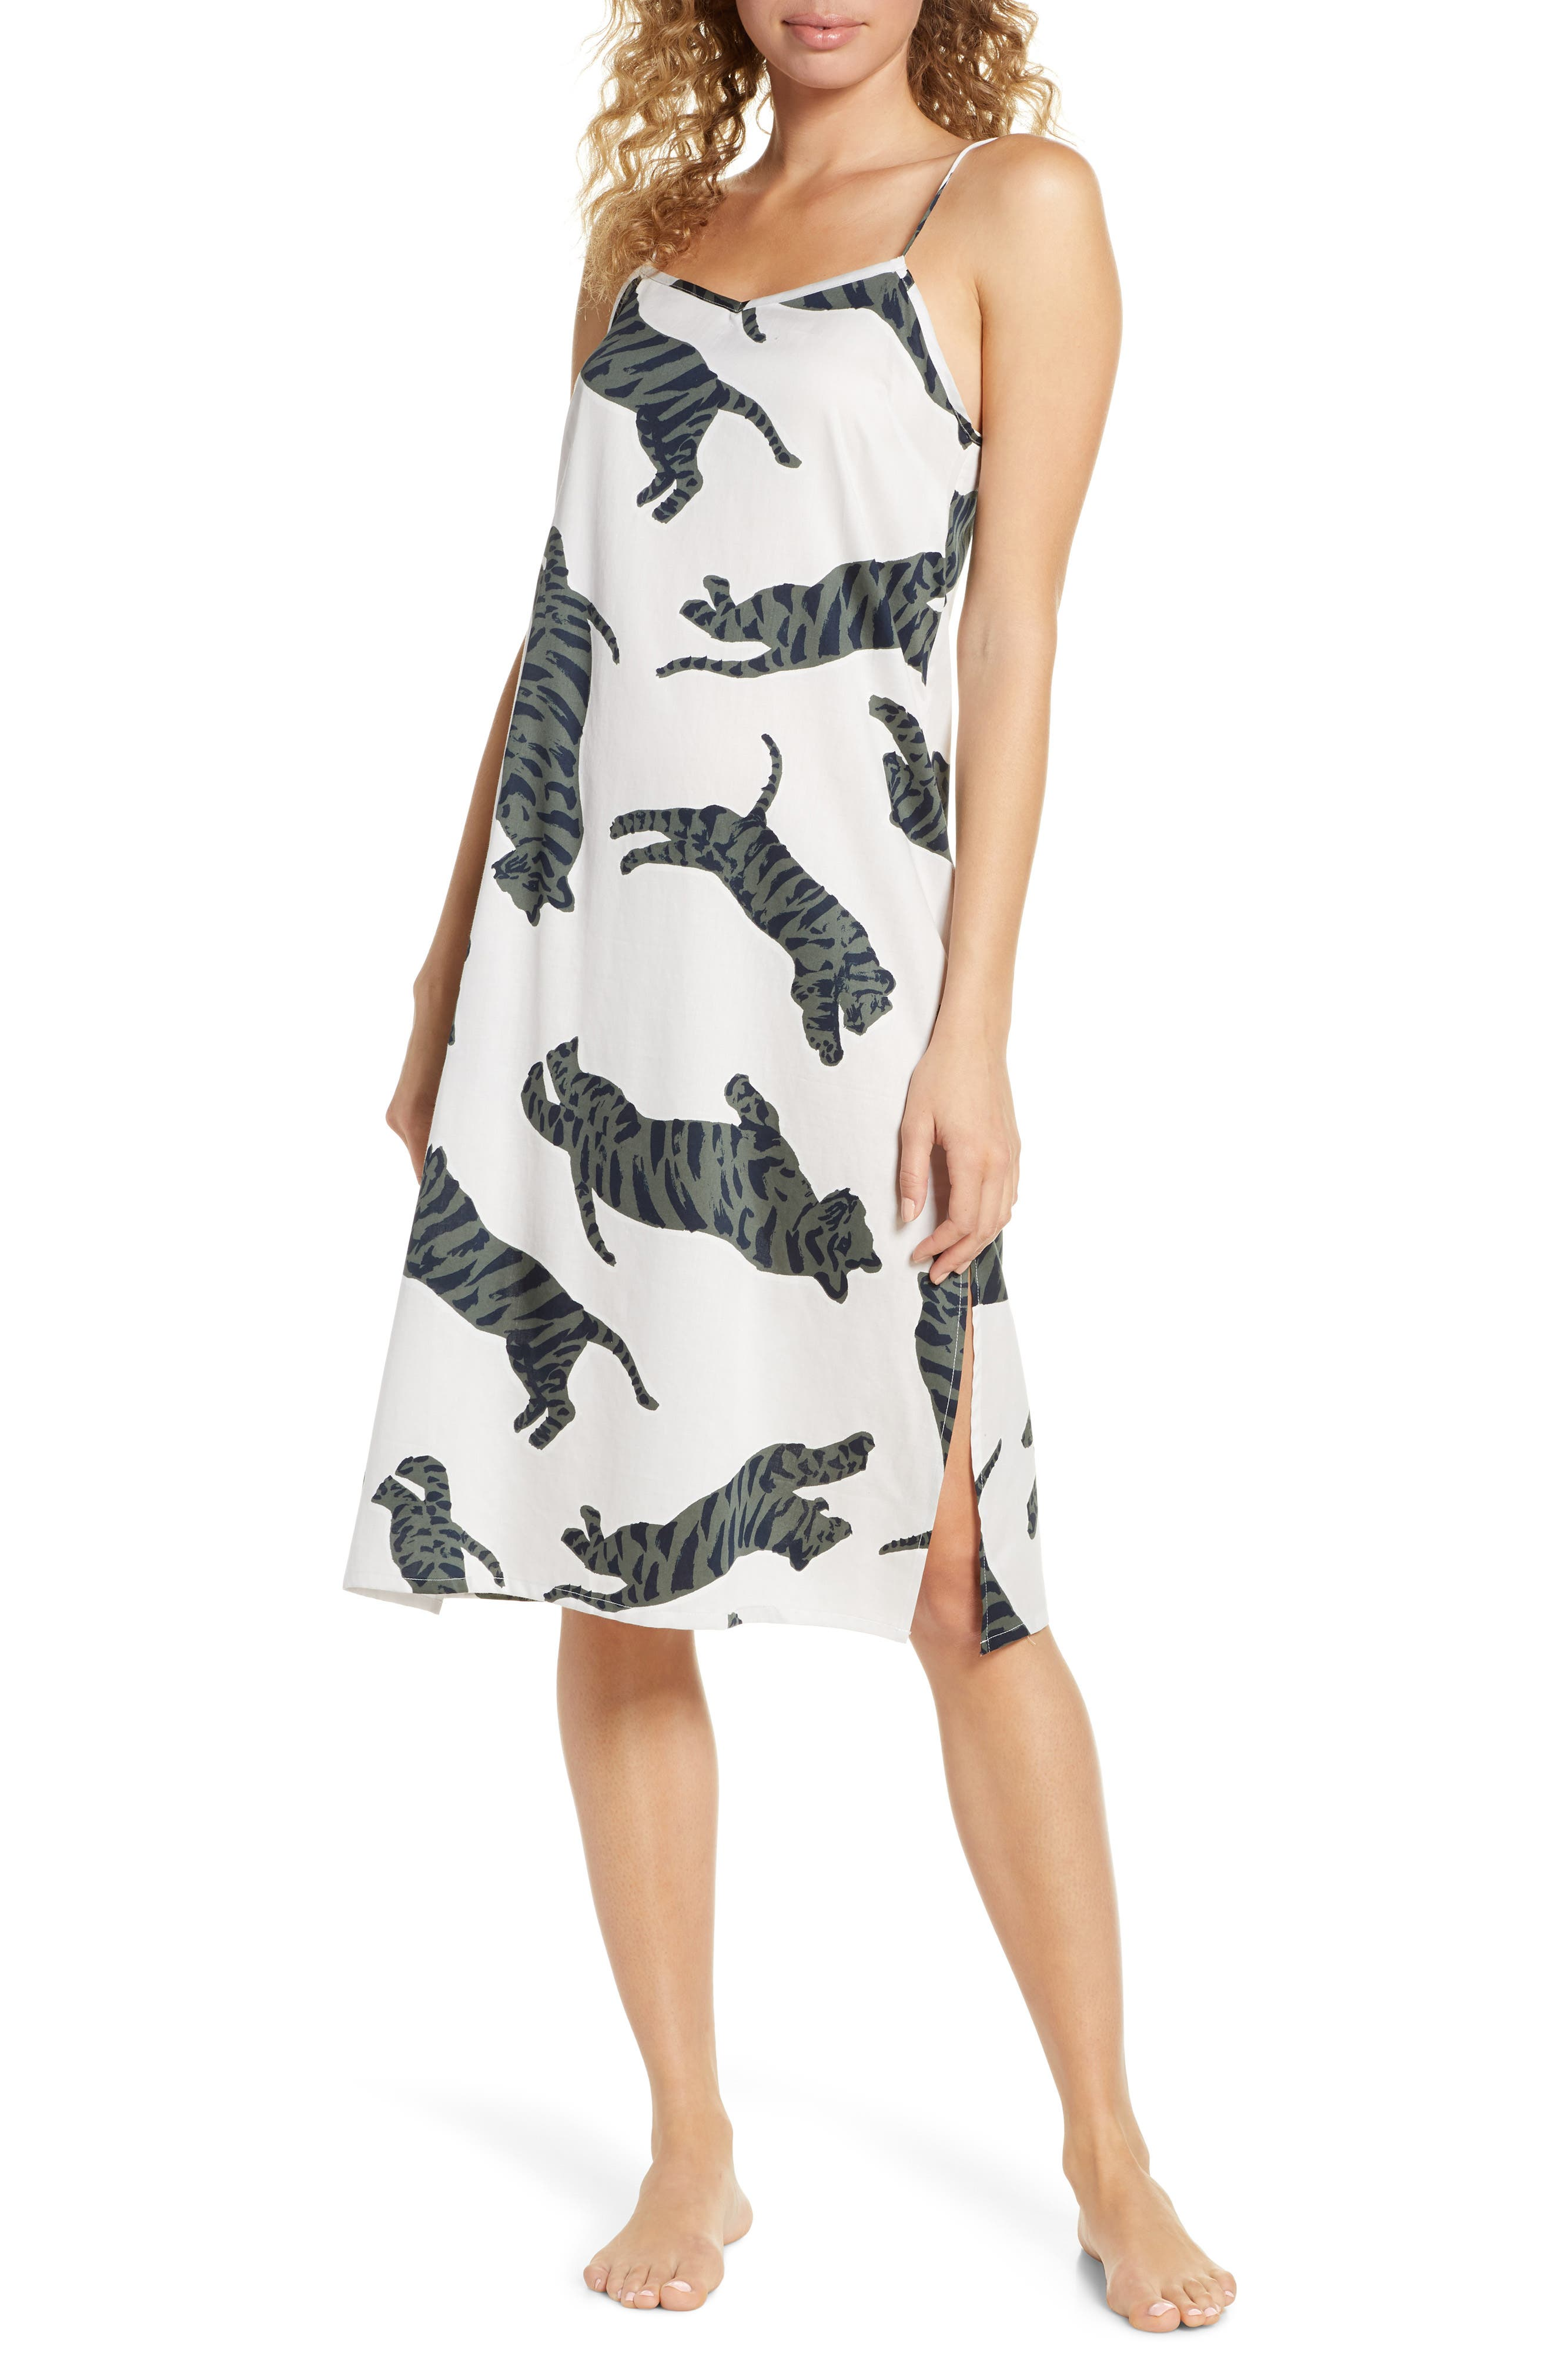 Chalmers Jess Tiger Moon Nightgown, Grey